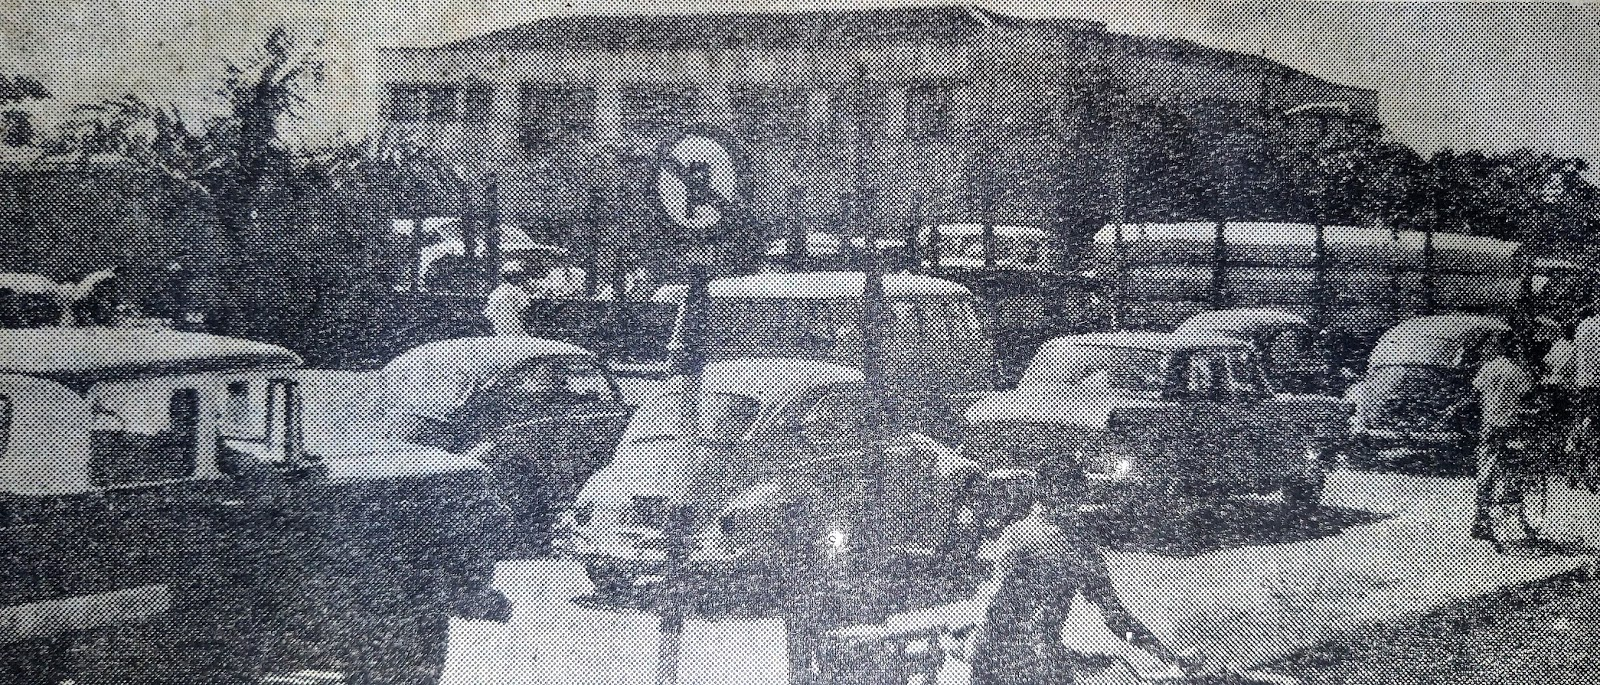 Avenida Paraná e Delegacia - 1972